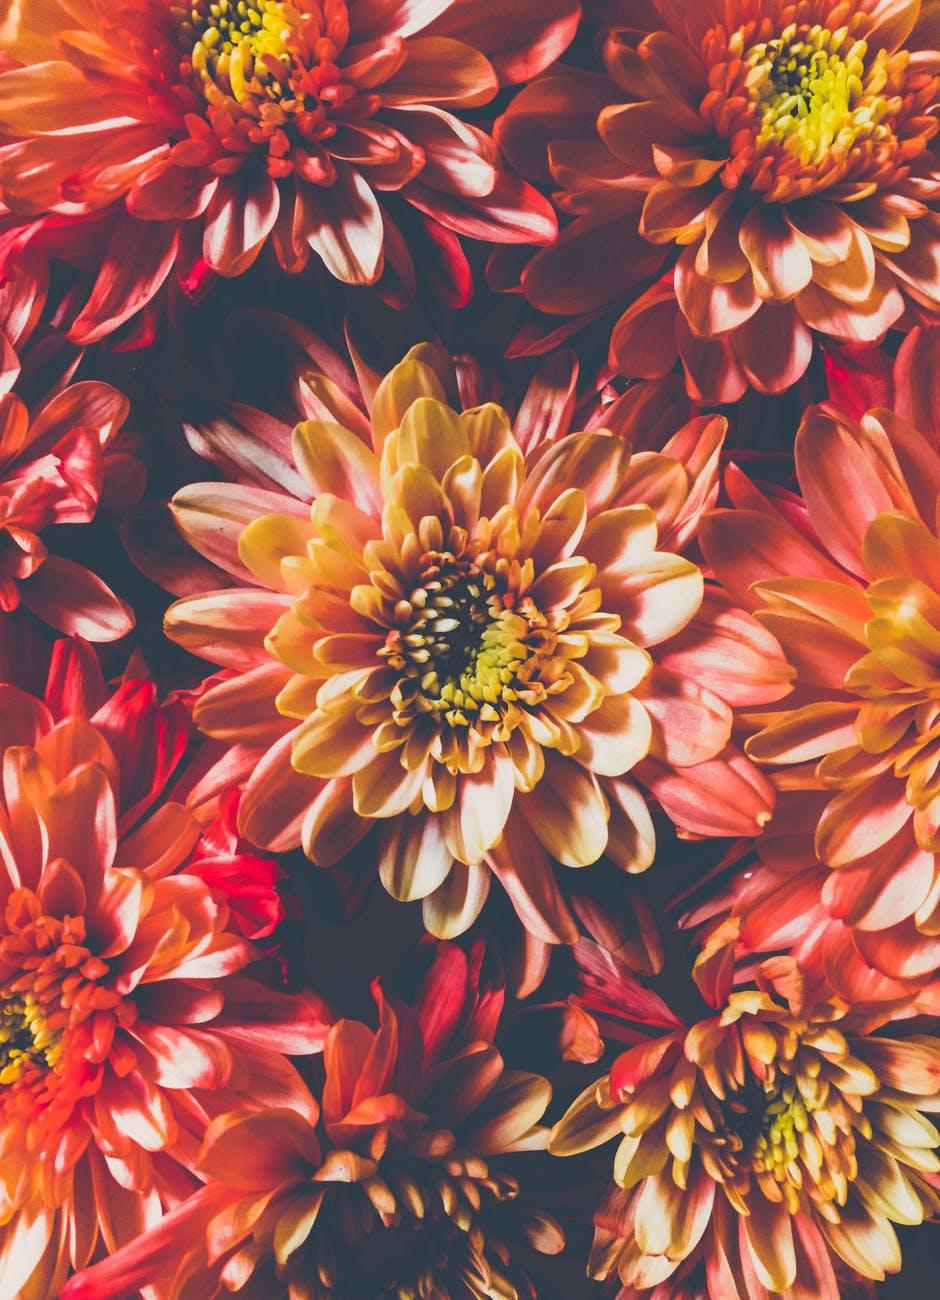 orange chrysanthemum flowers in closeup photo